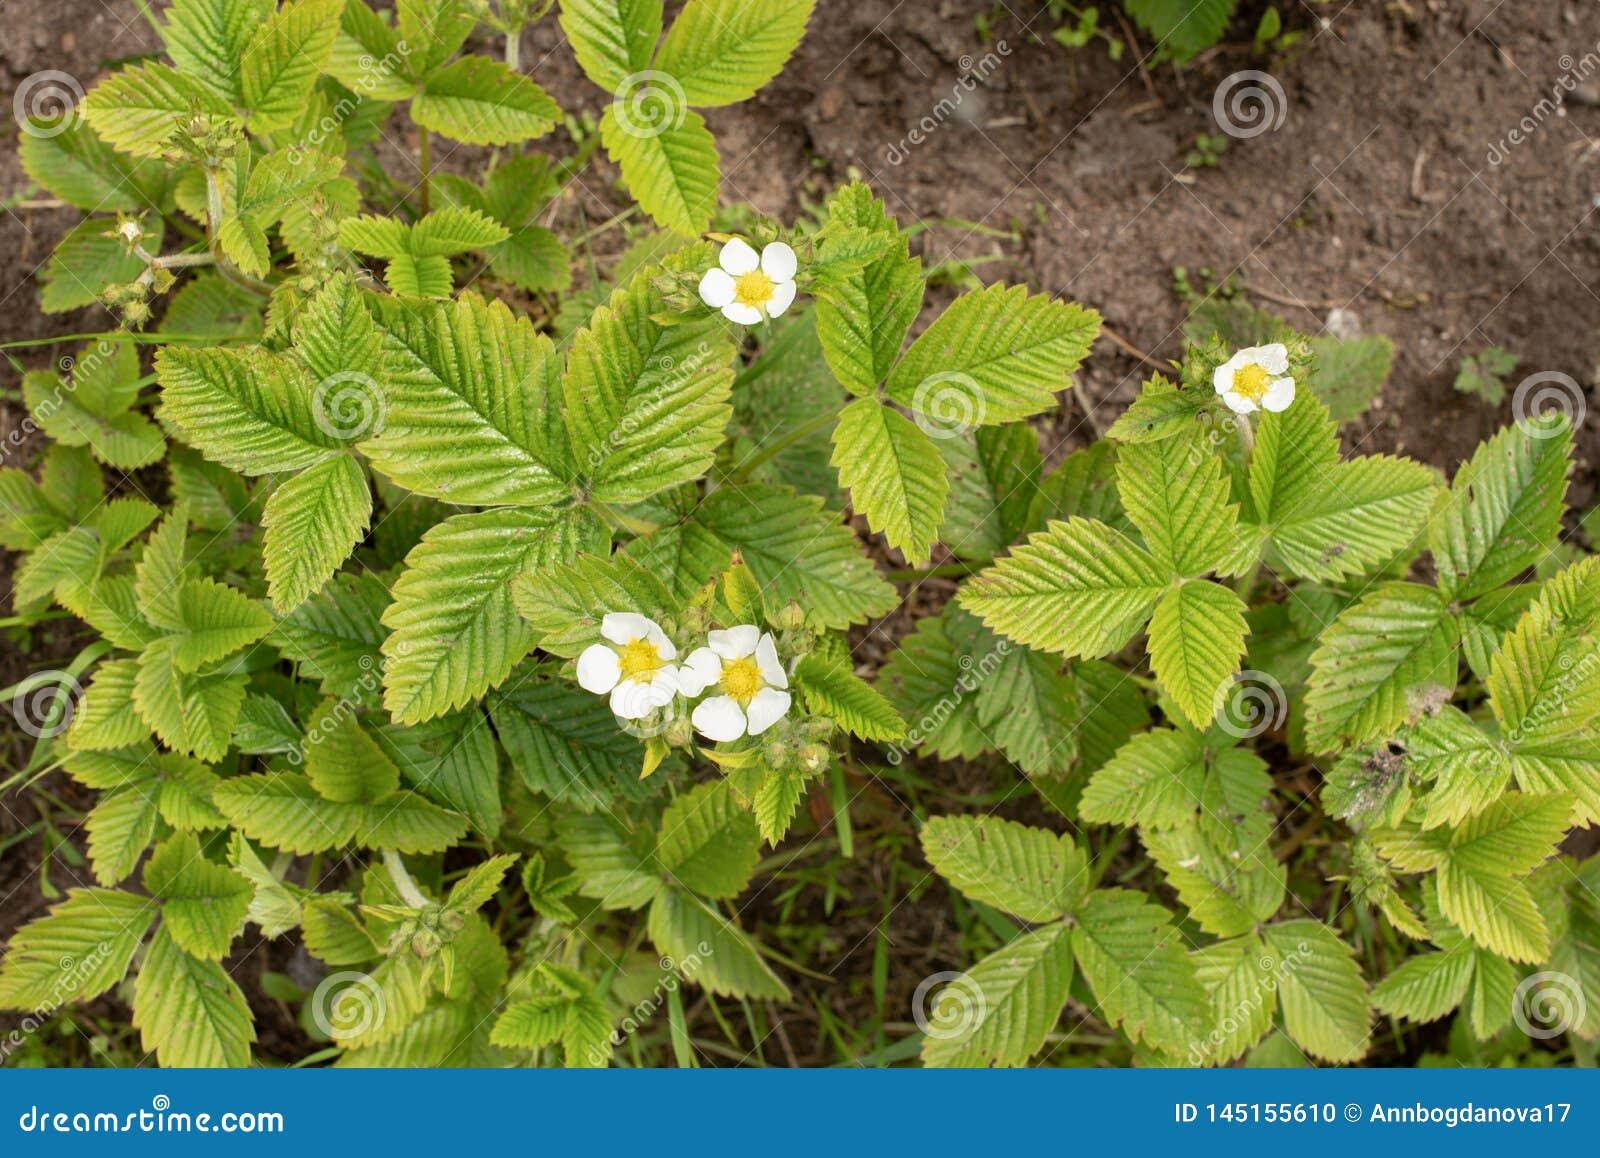 Fragole di fioritura in primavera